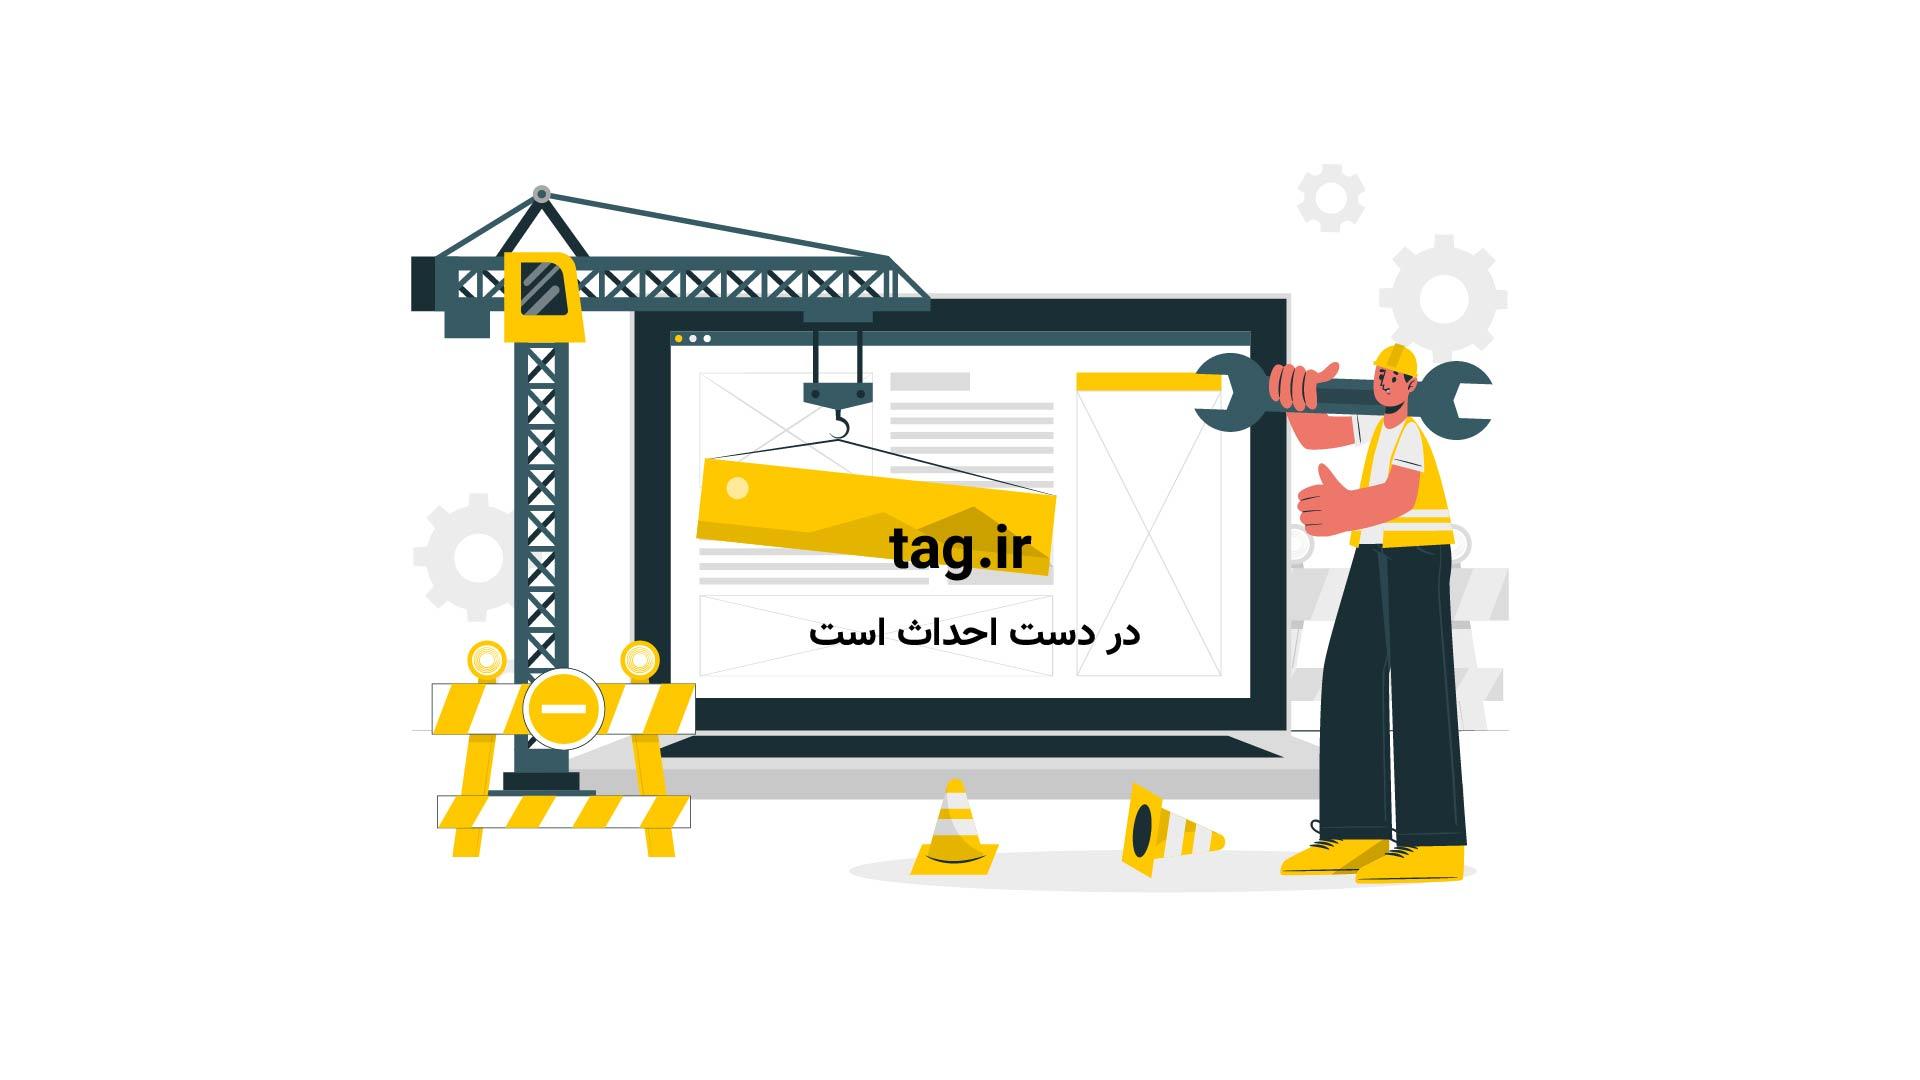 اوریگامی گل لاله | تگ